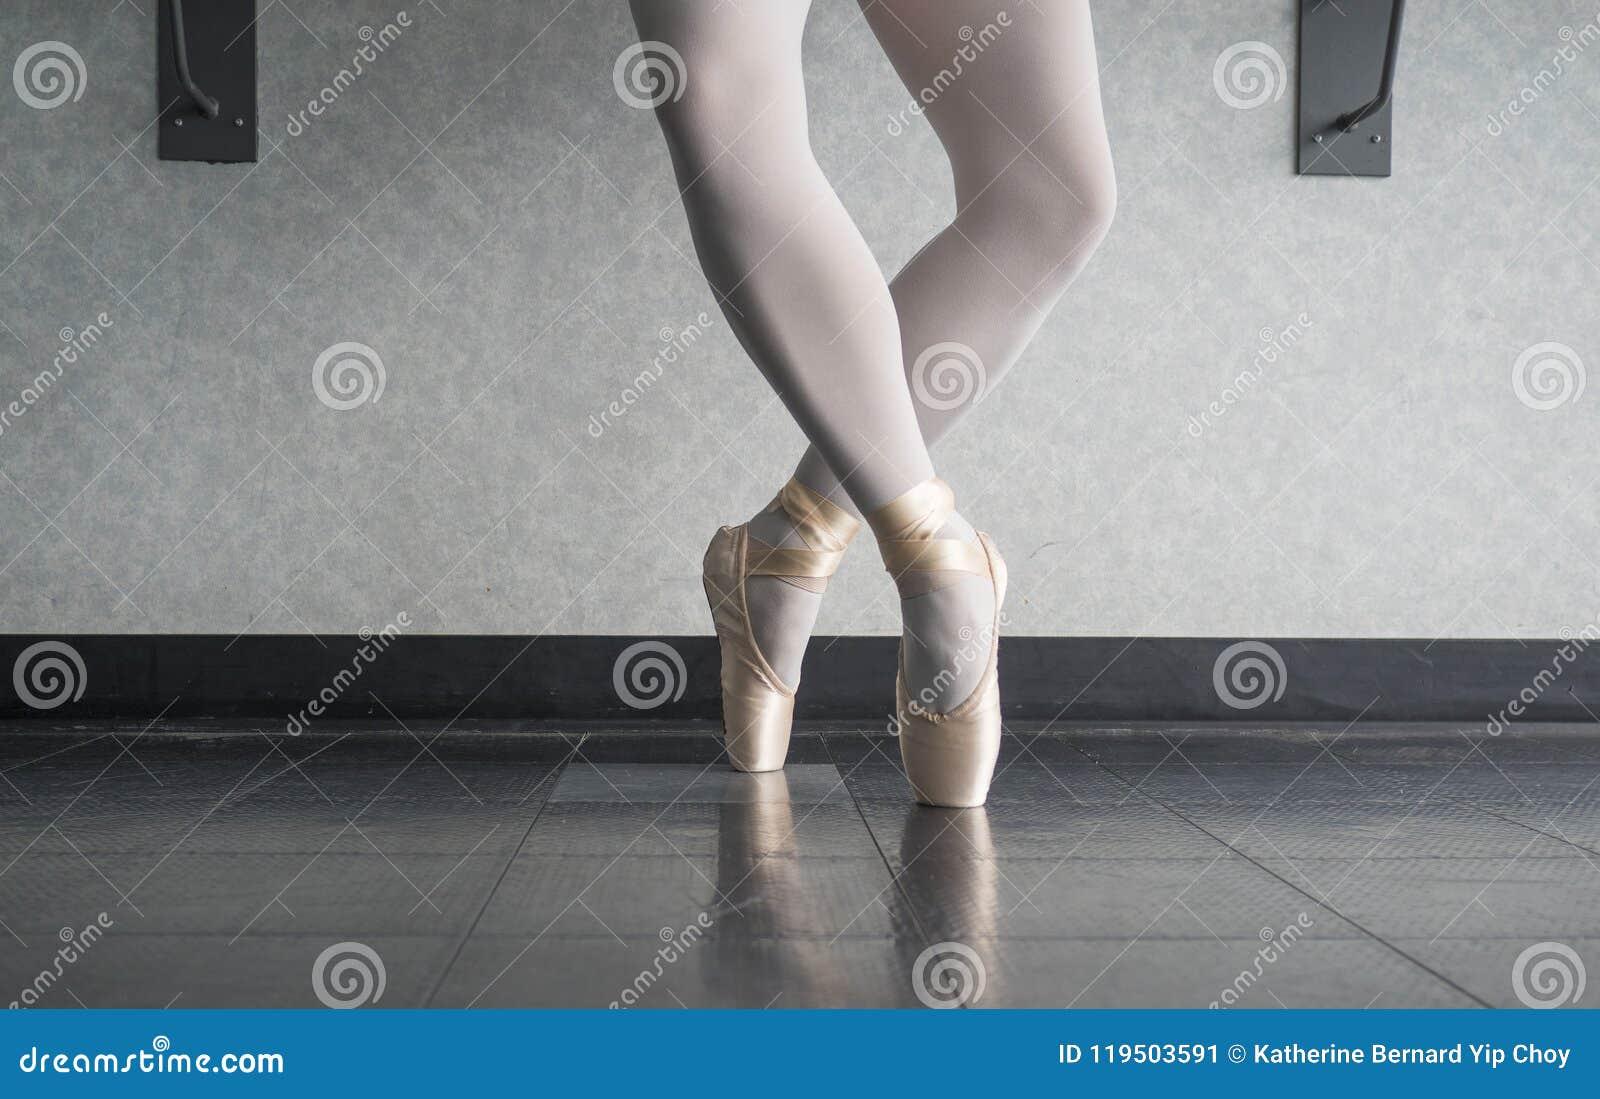 Ballerina dancer in the ballet studio en pointe in releve fourth position